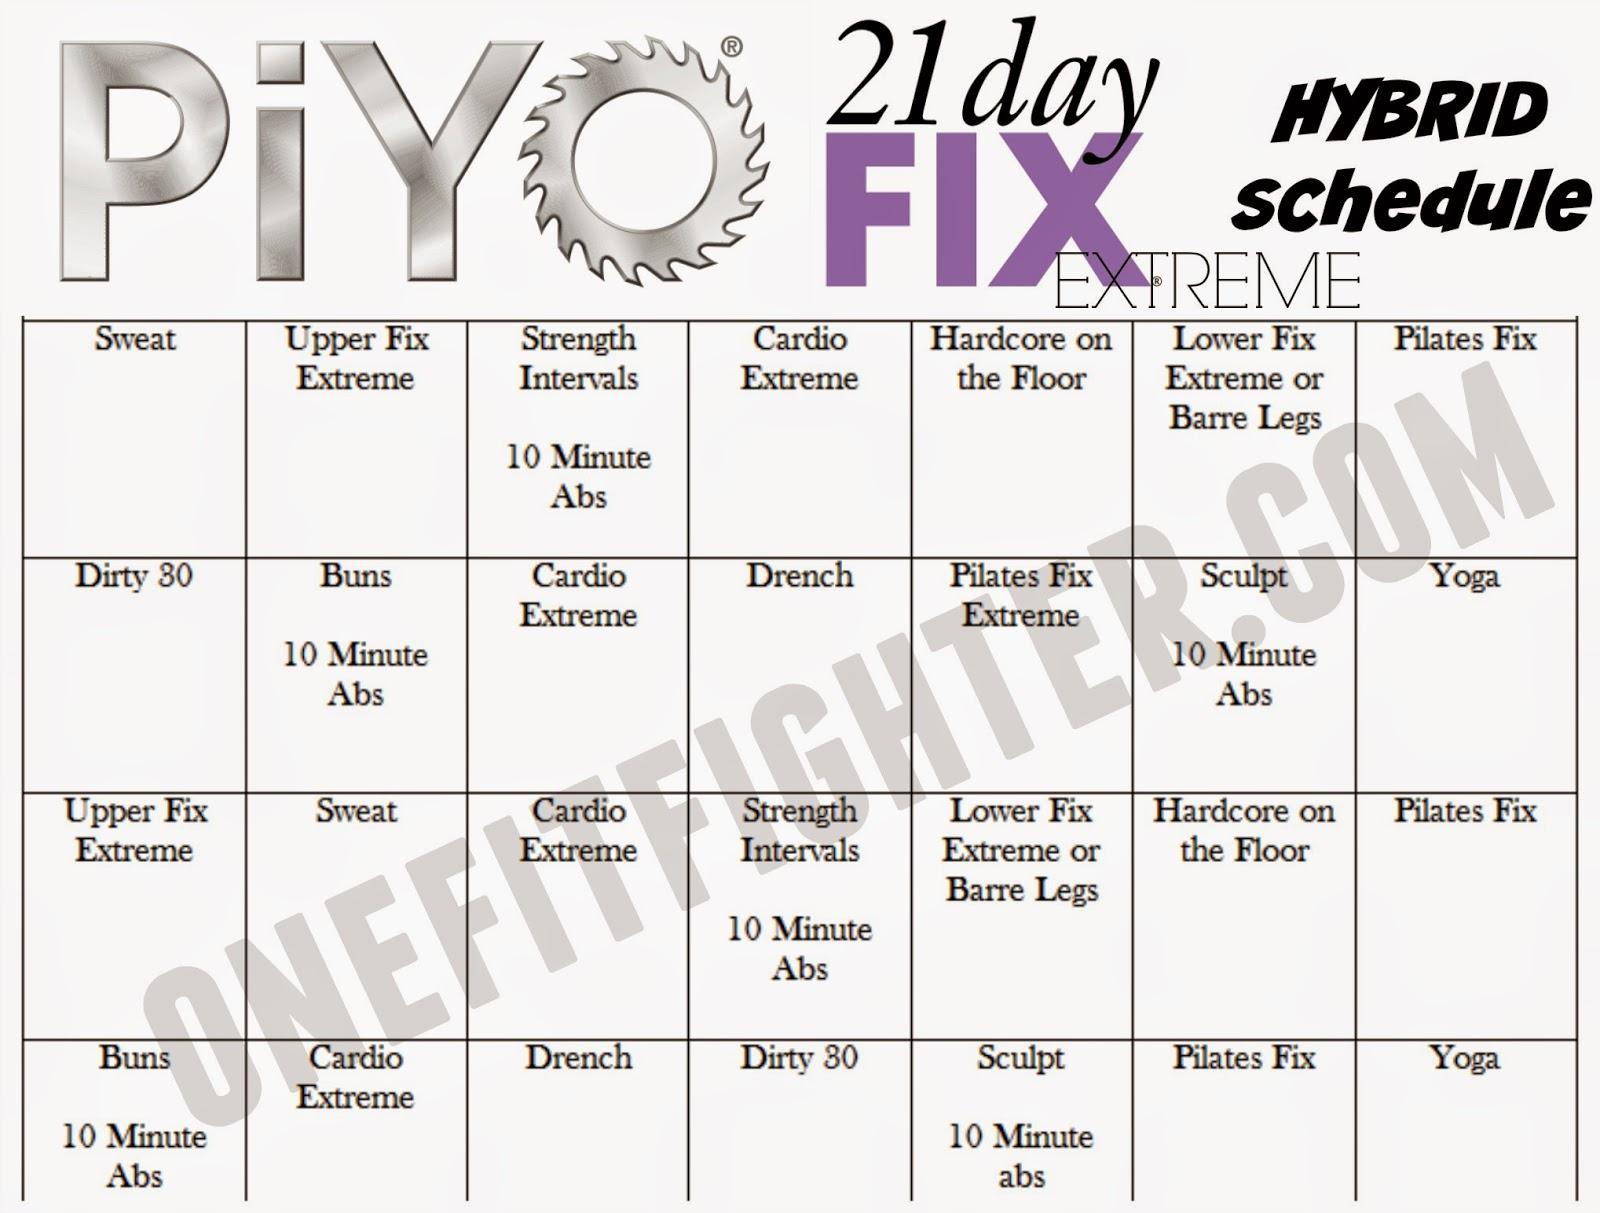 Piyo Hybrid Calendars | Calendar For Planning within Piyo 21 Day Fix Hybrid